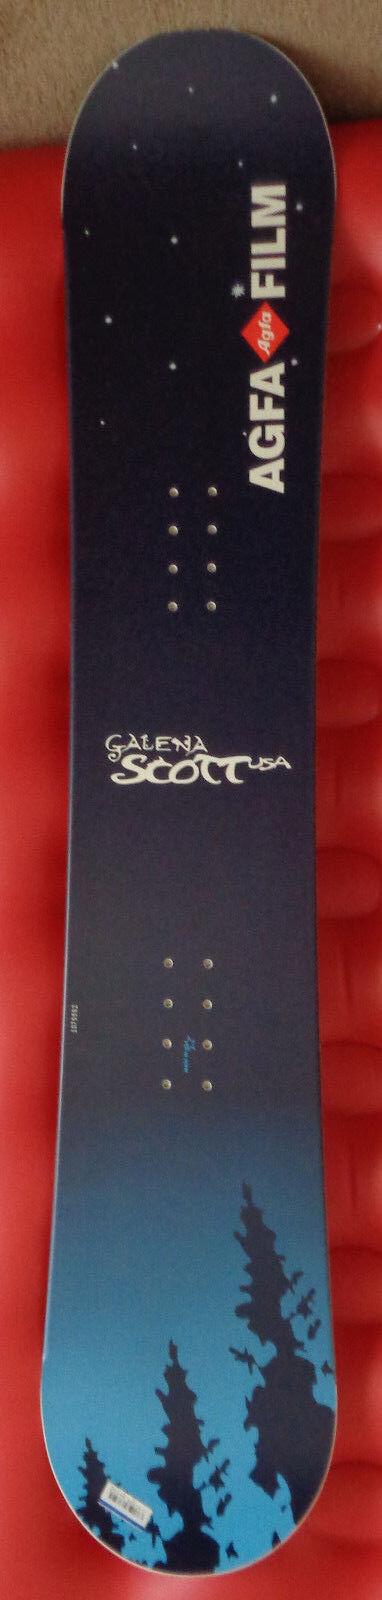 NEW AGFA FILM GALENA SCOTT USA 155 CM Snowboard FREE S&H Lower 48